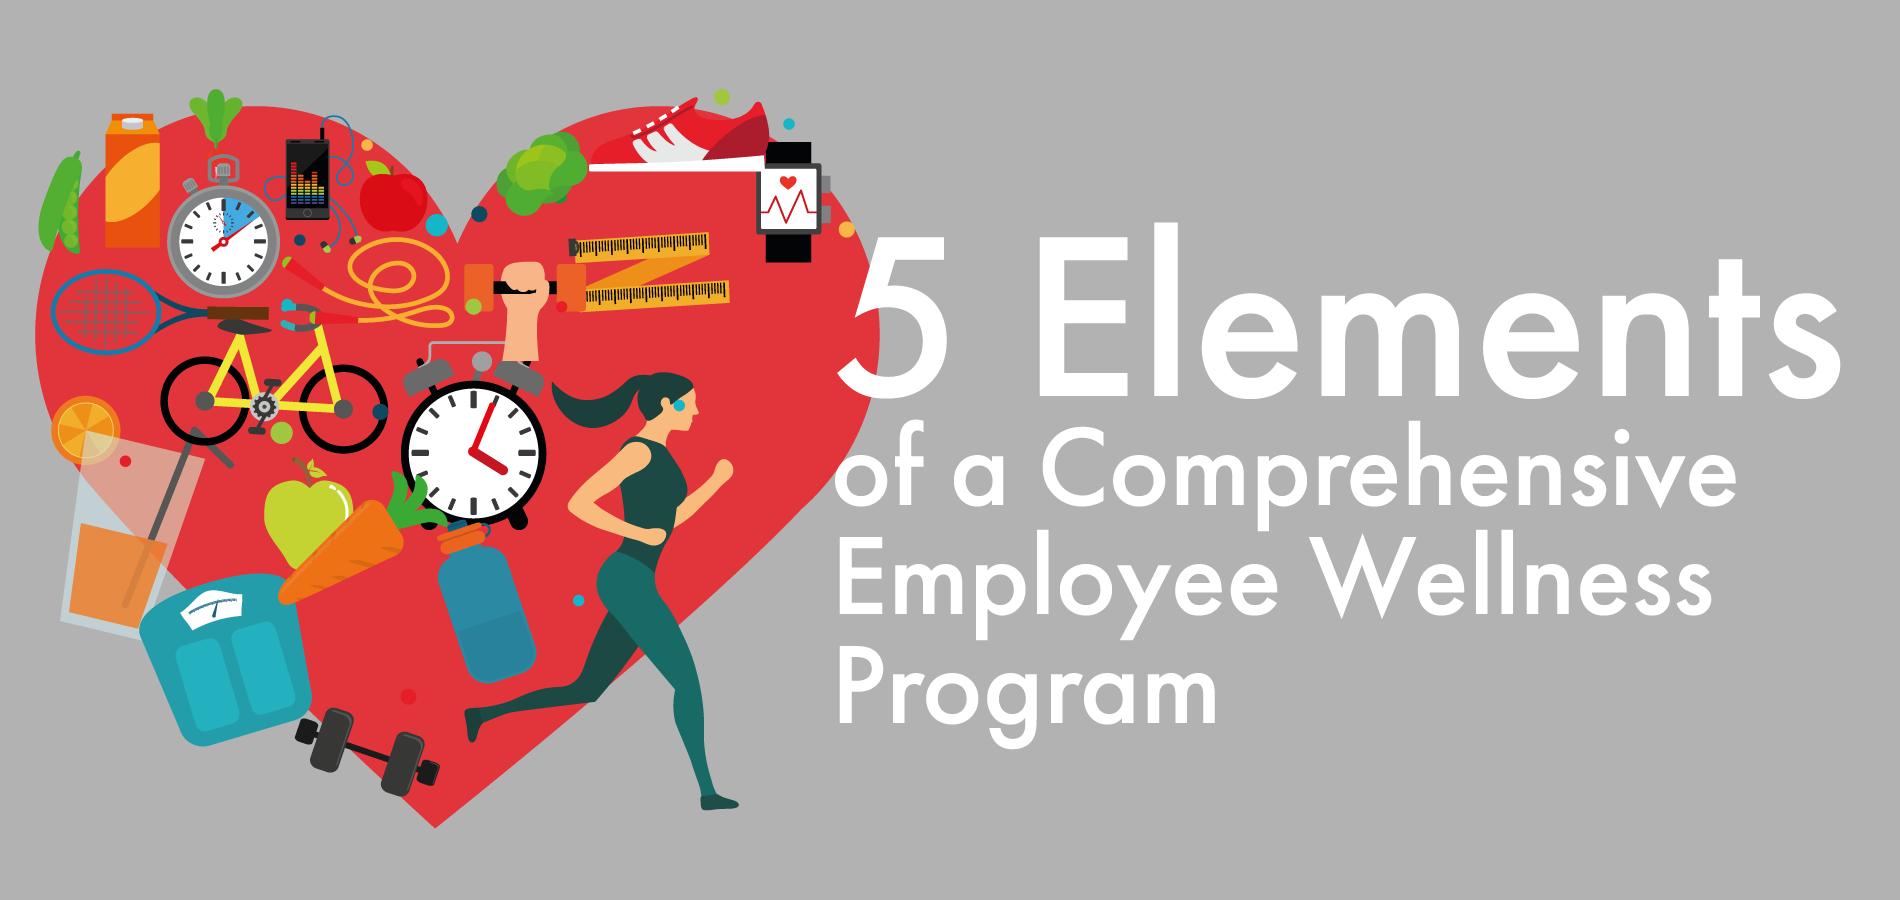 5 Elements of a Comprehensive Employee Wellness Program